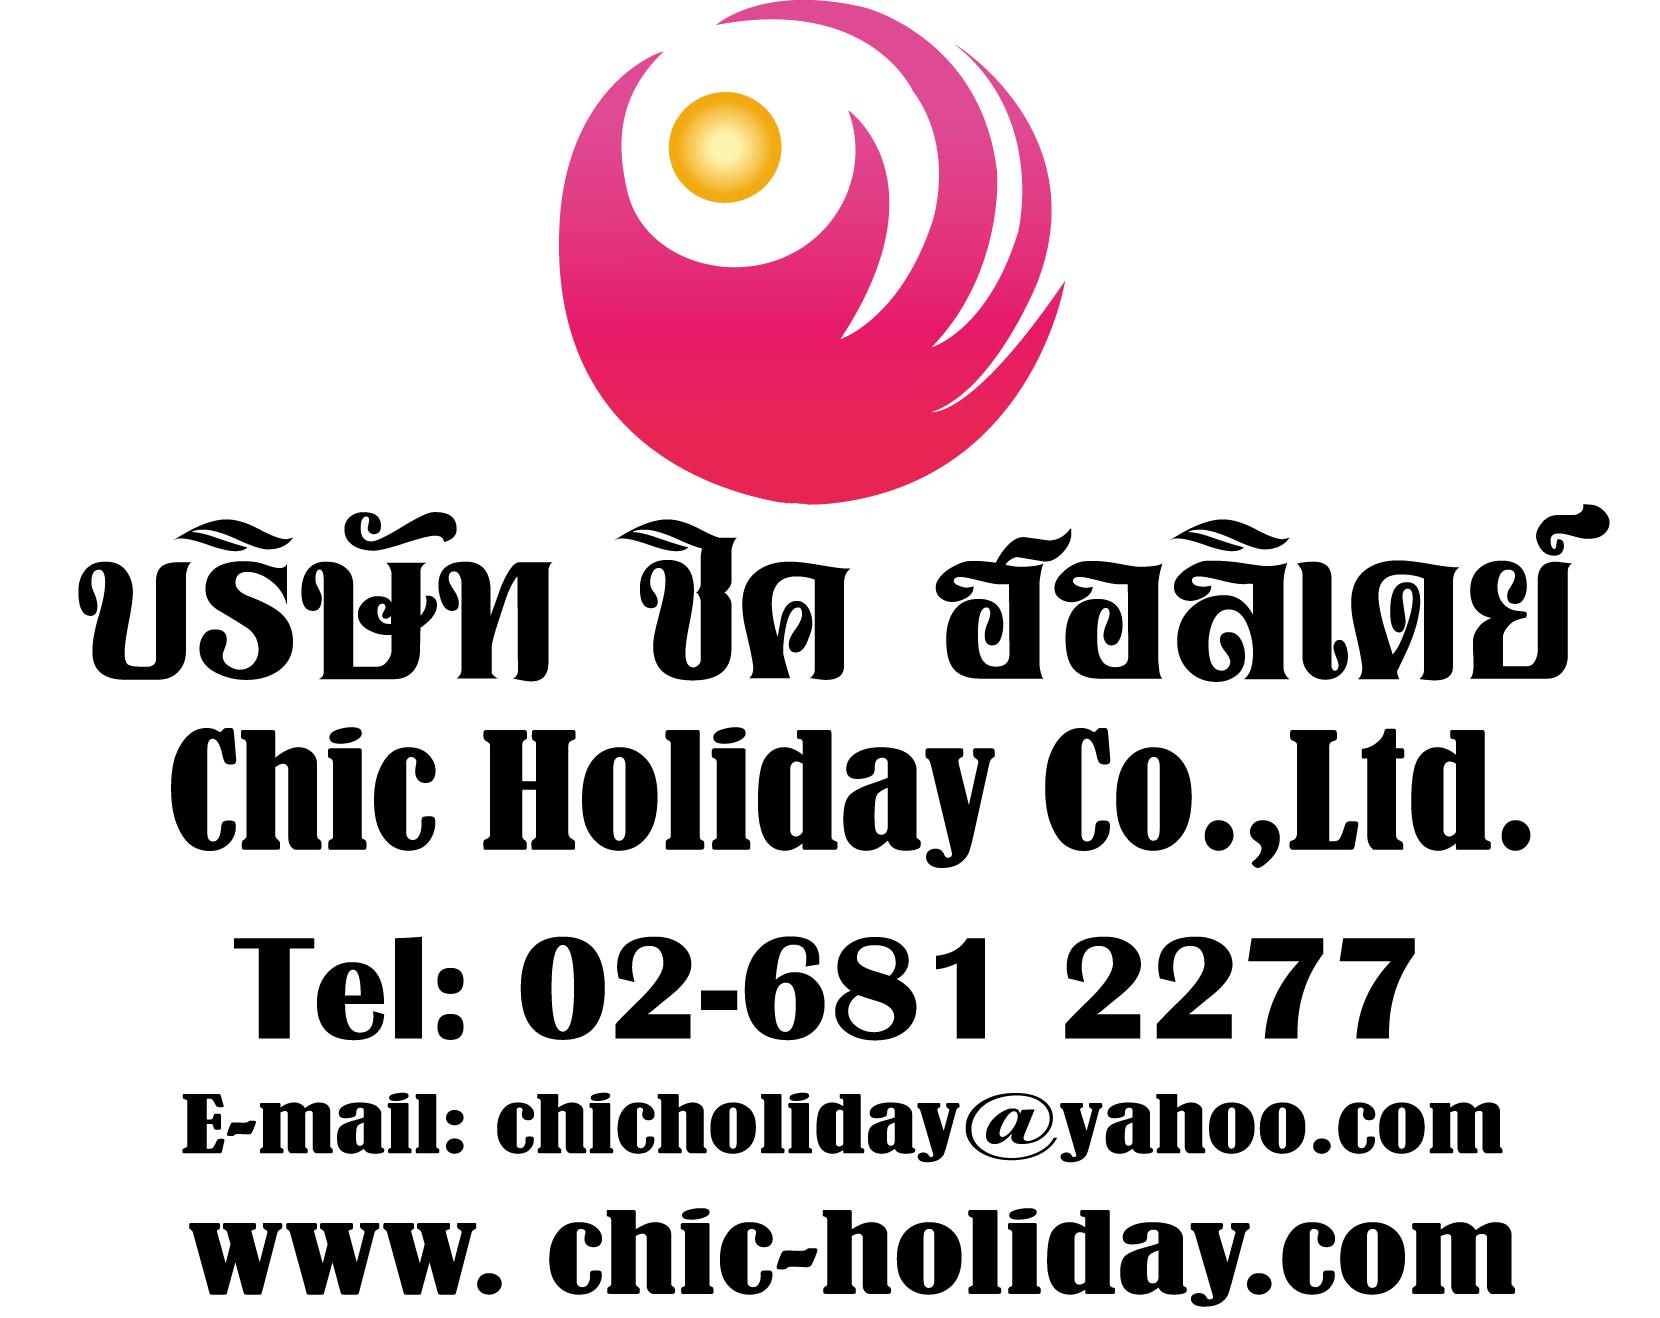 Chic Holiday